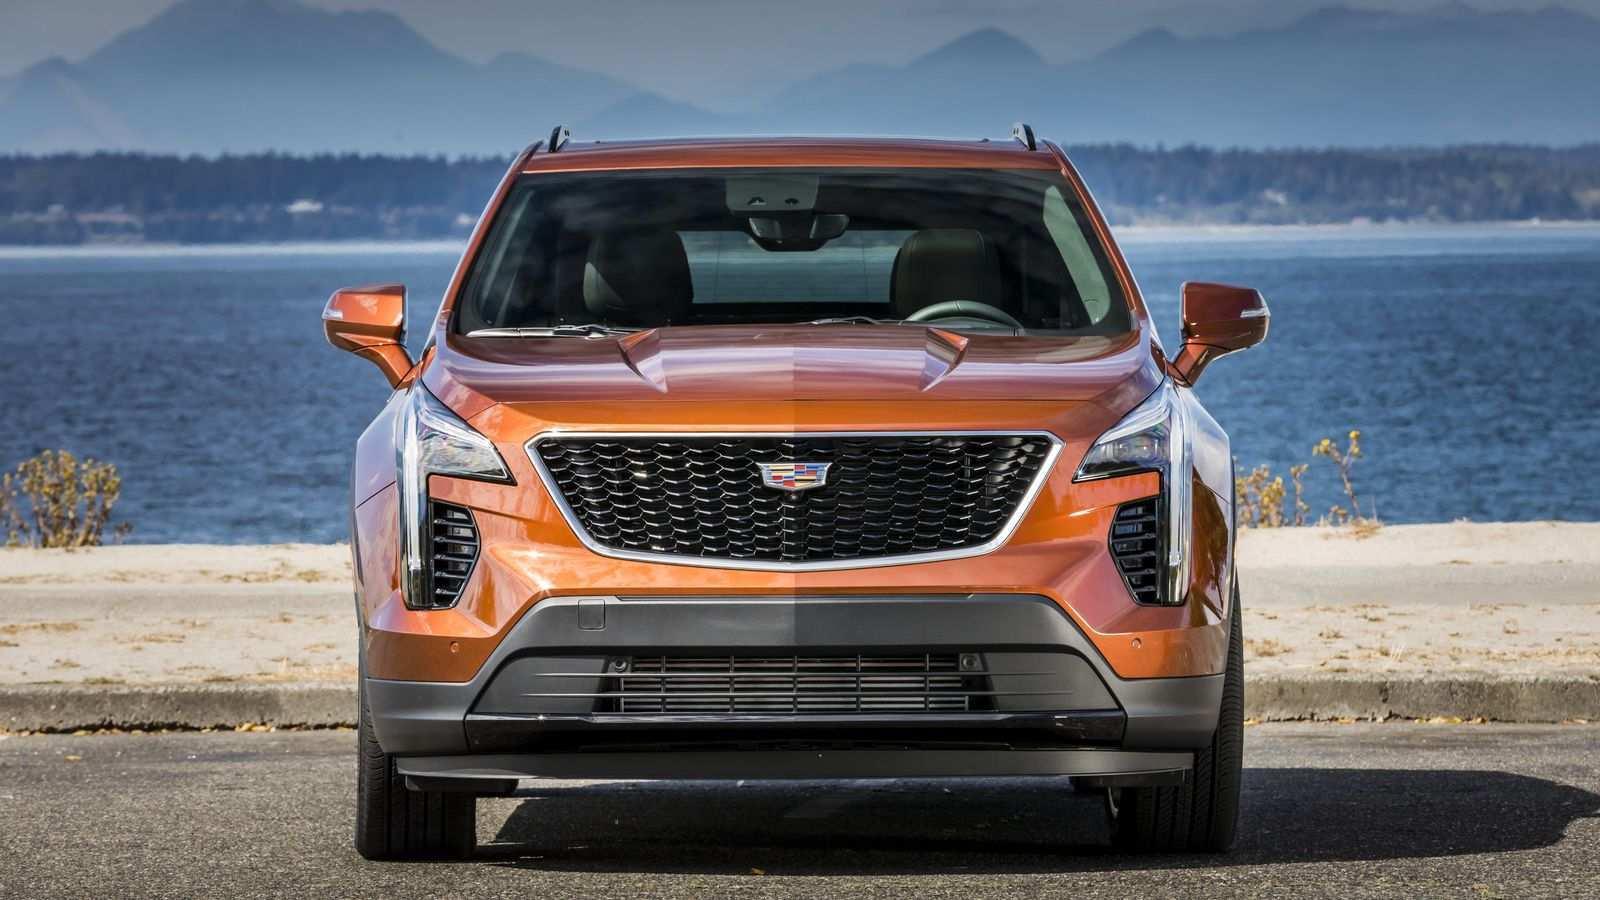 51 Gallery of 2019 Cadillac Diesel Release Date by 2019 Cadillac Diesel